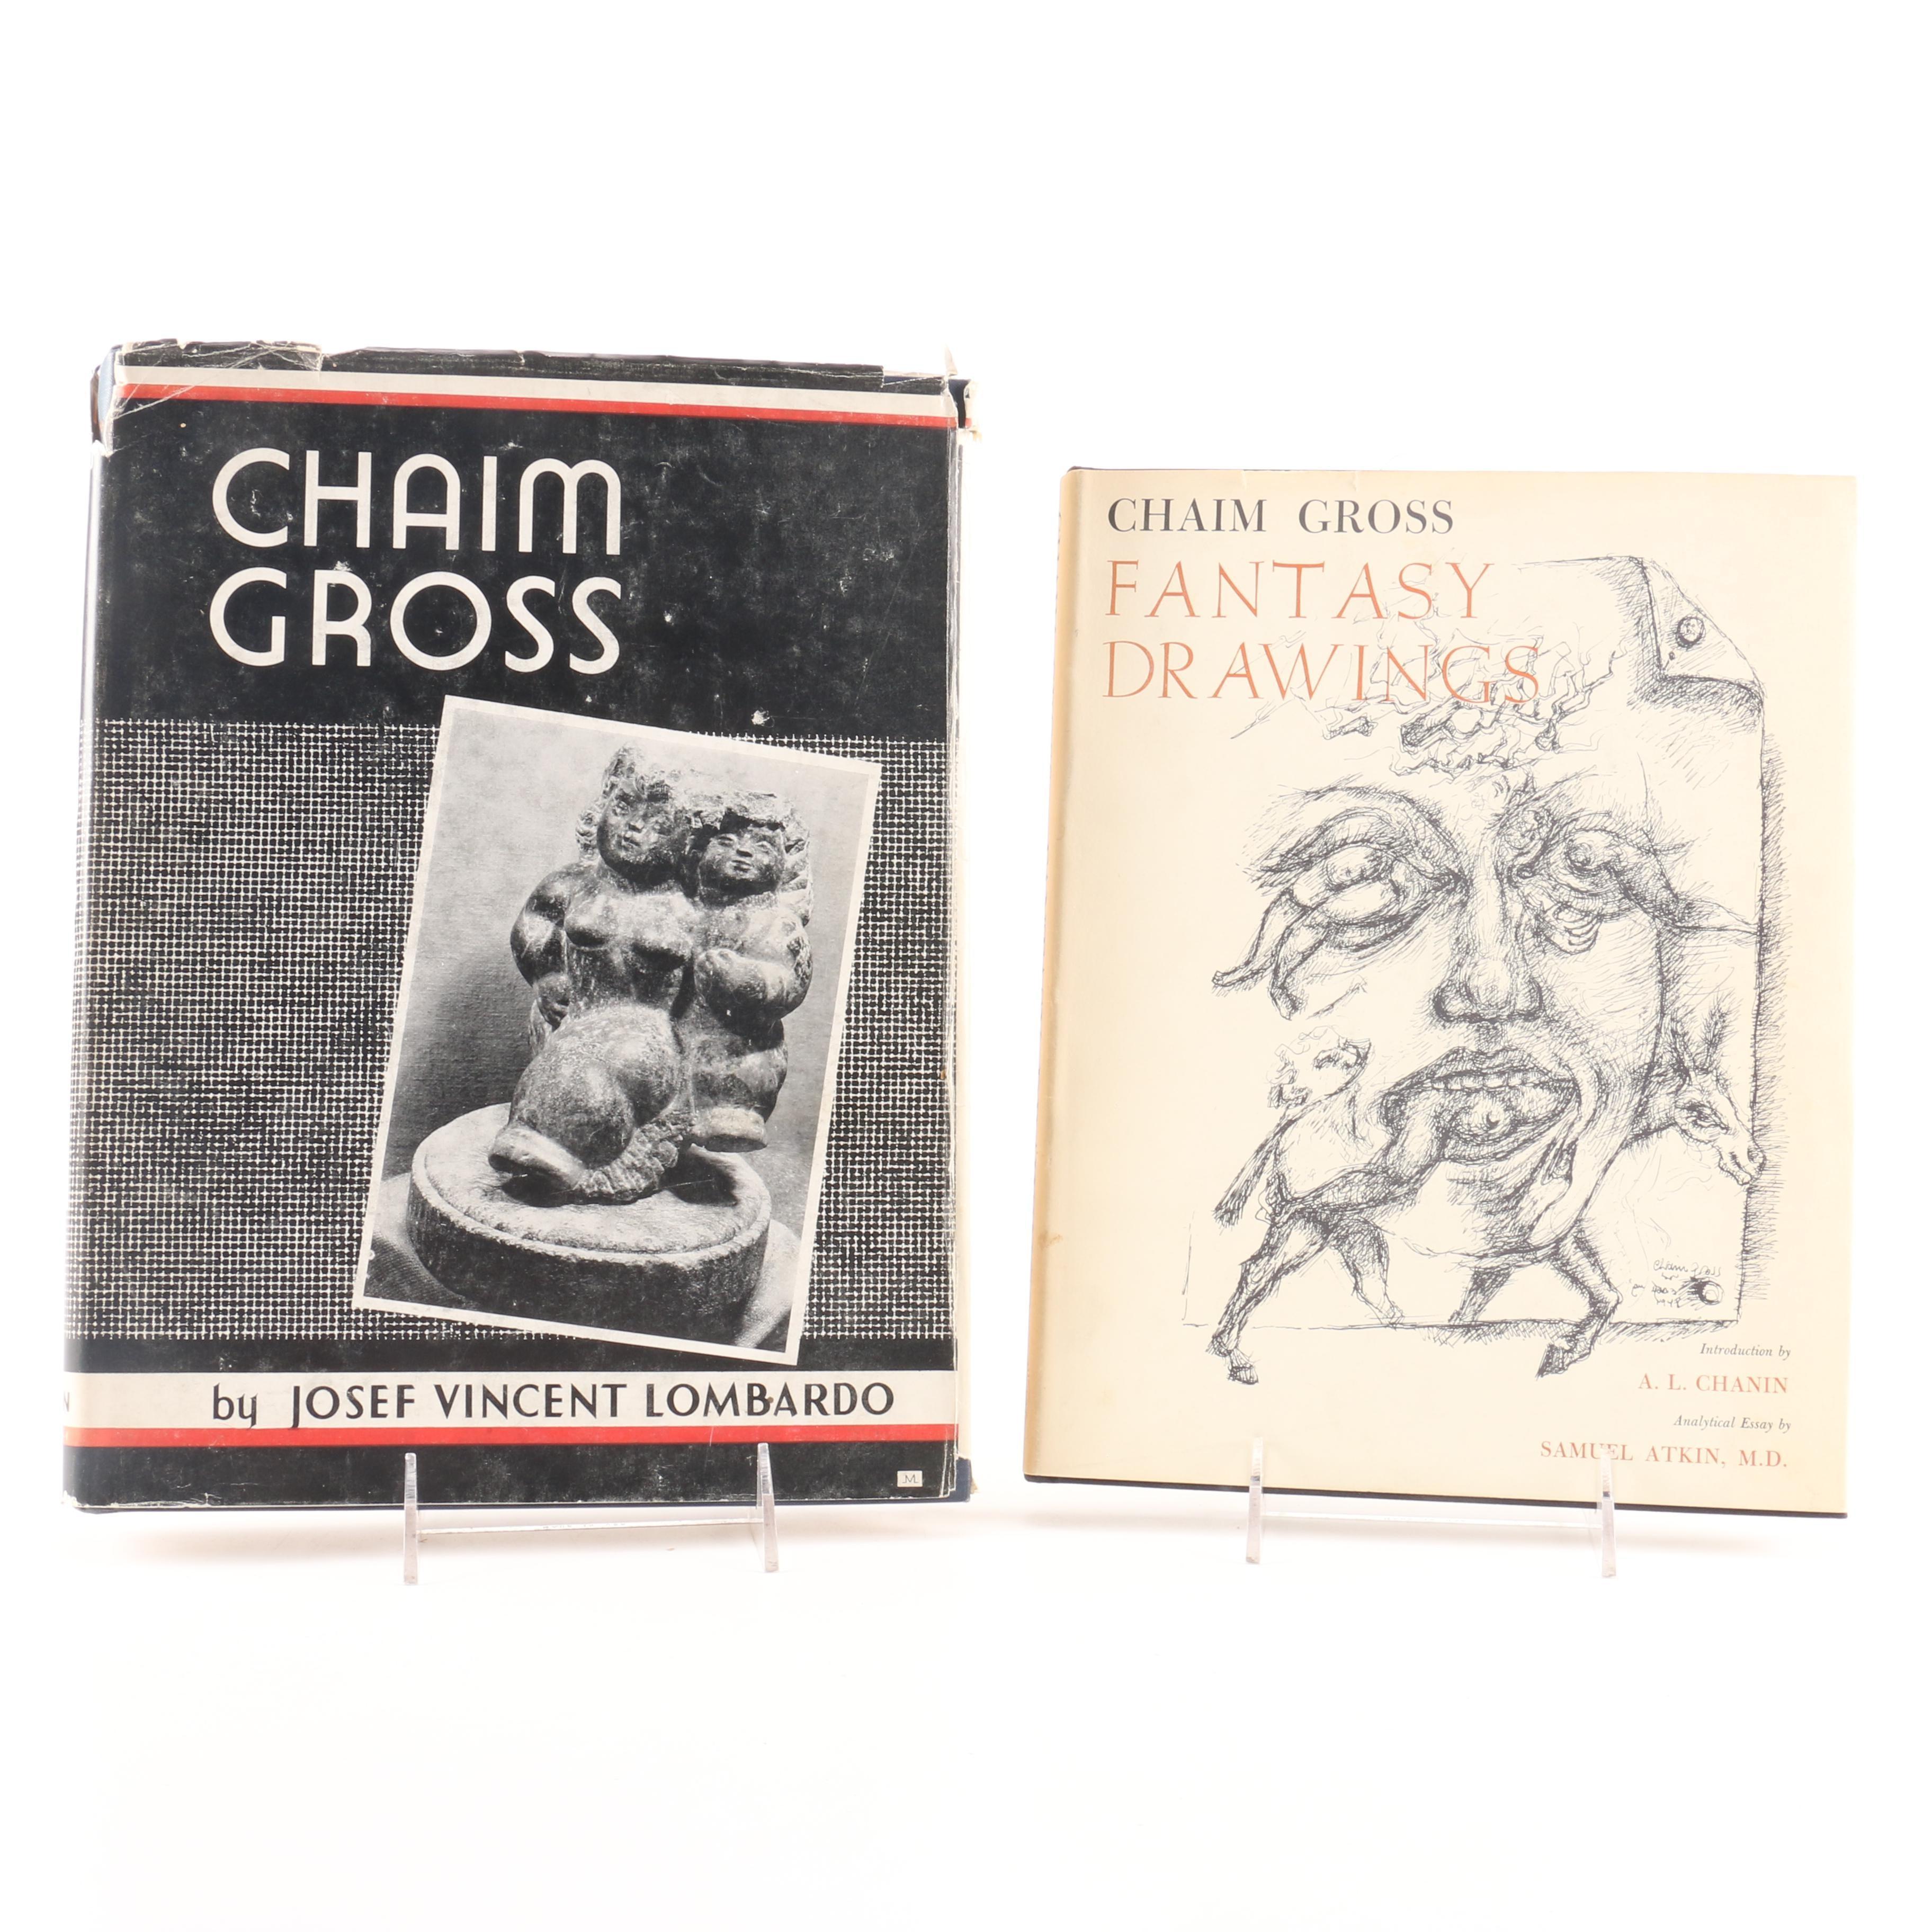 Pair of Signed Vintage Chaim Gross Art Books